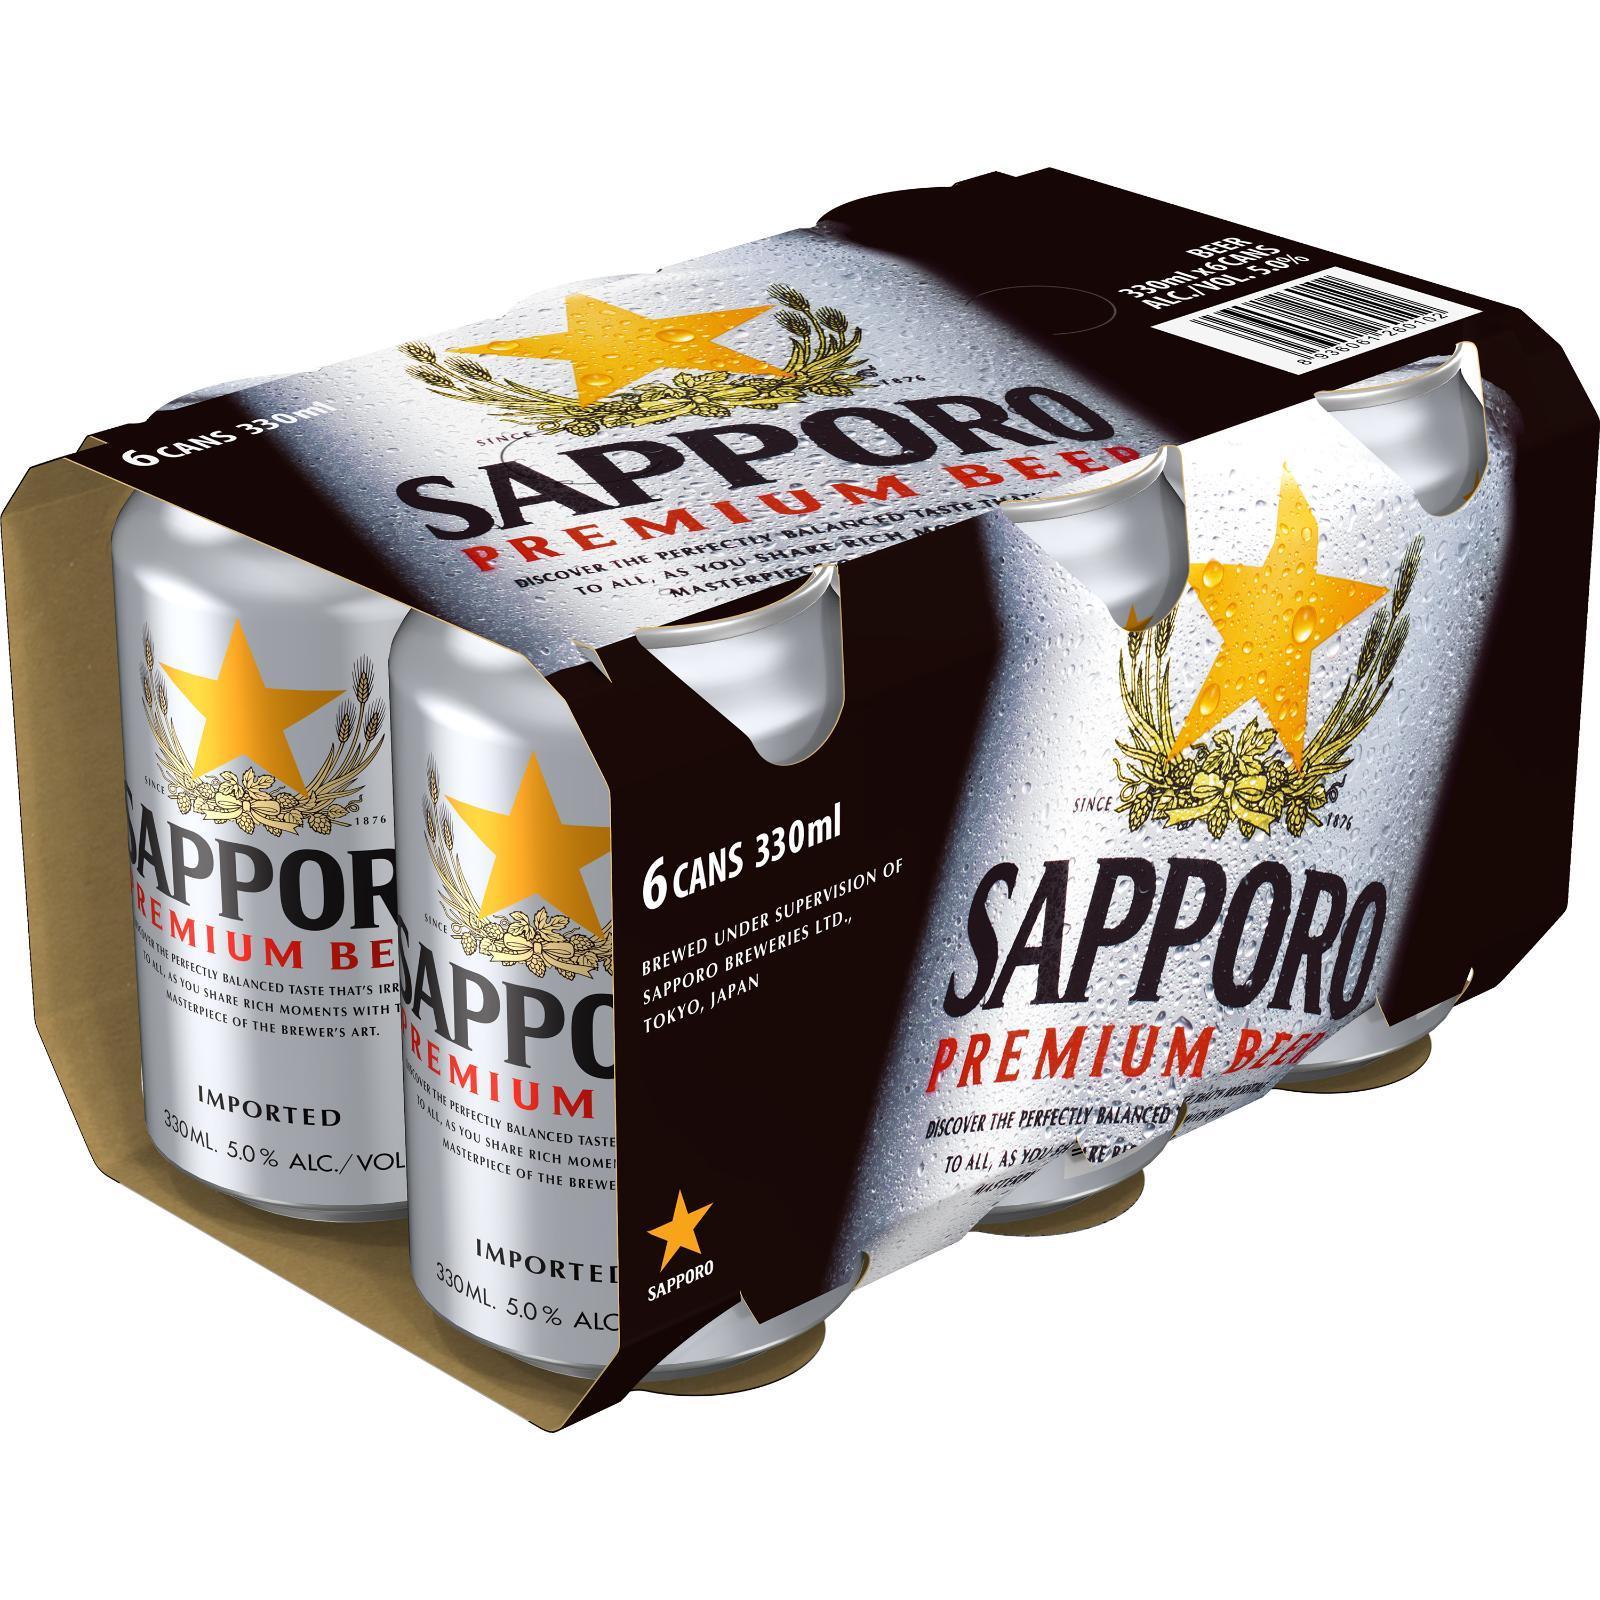 Sapporo Premium Draft Beer